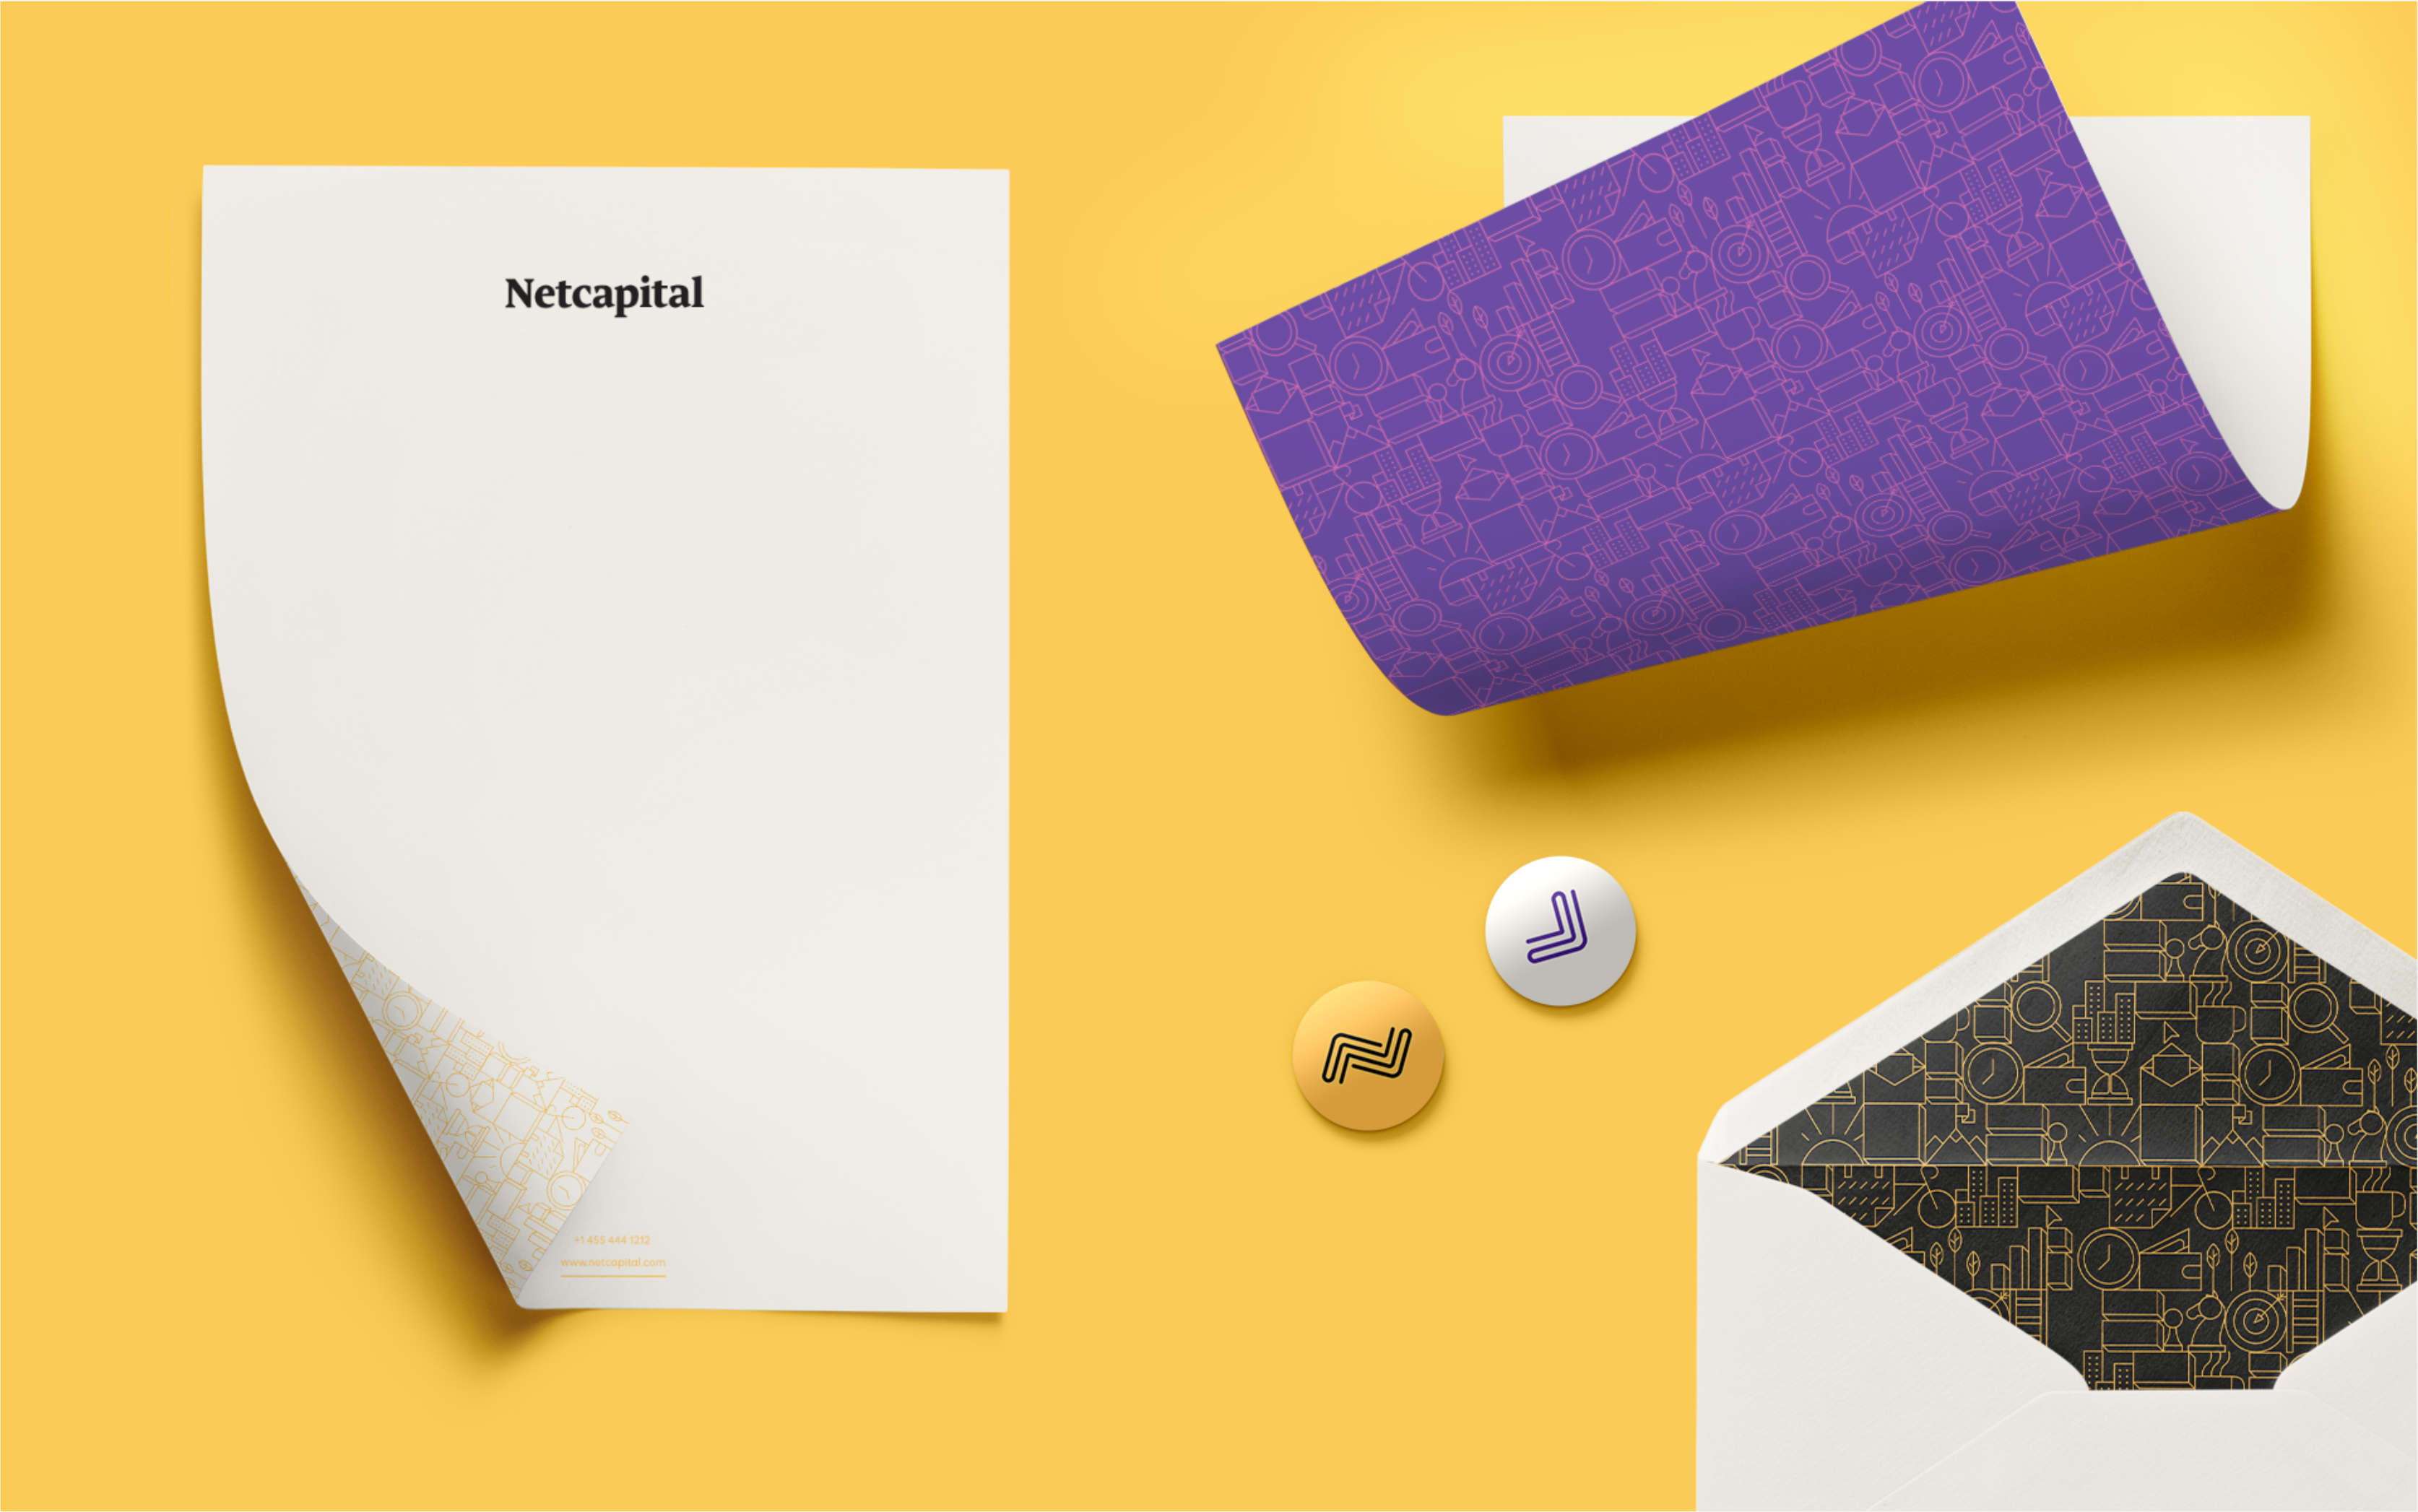 Netcapital branding collateral design.